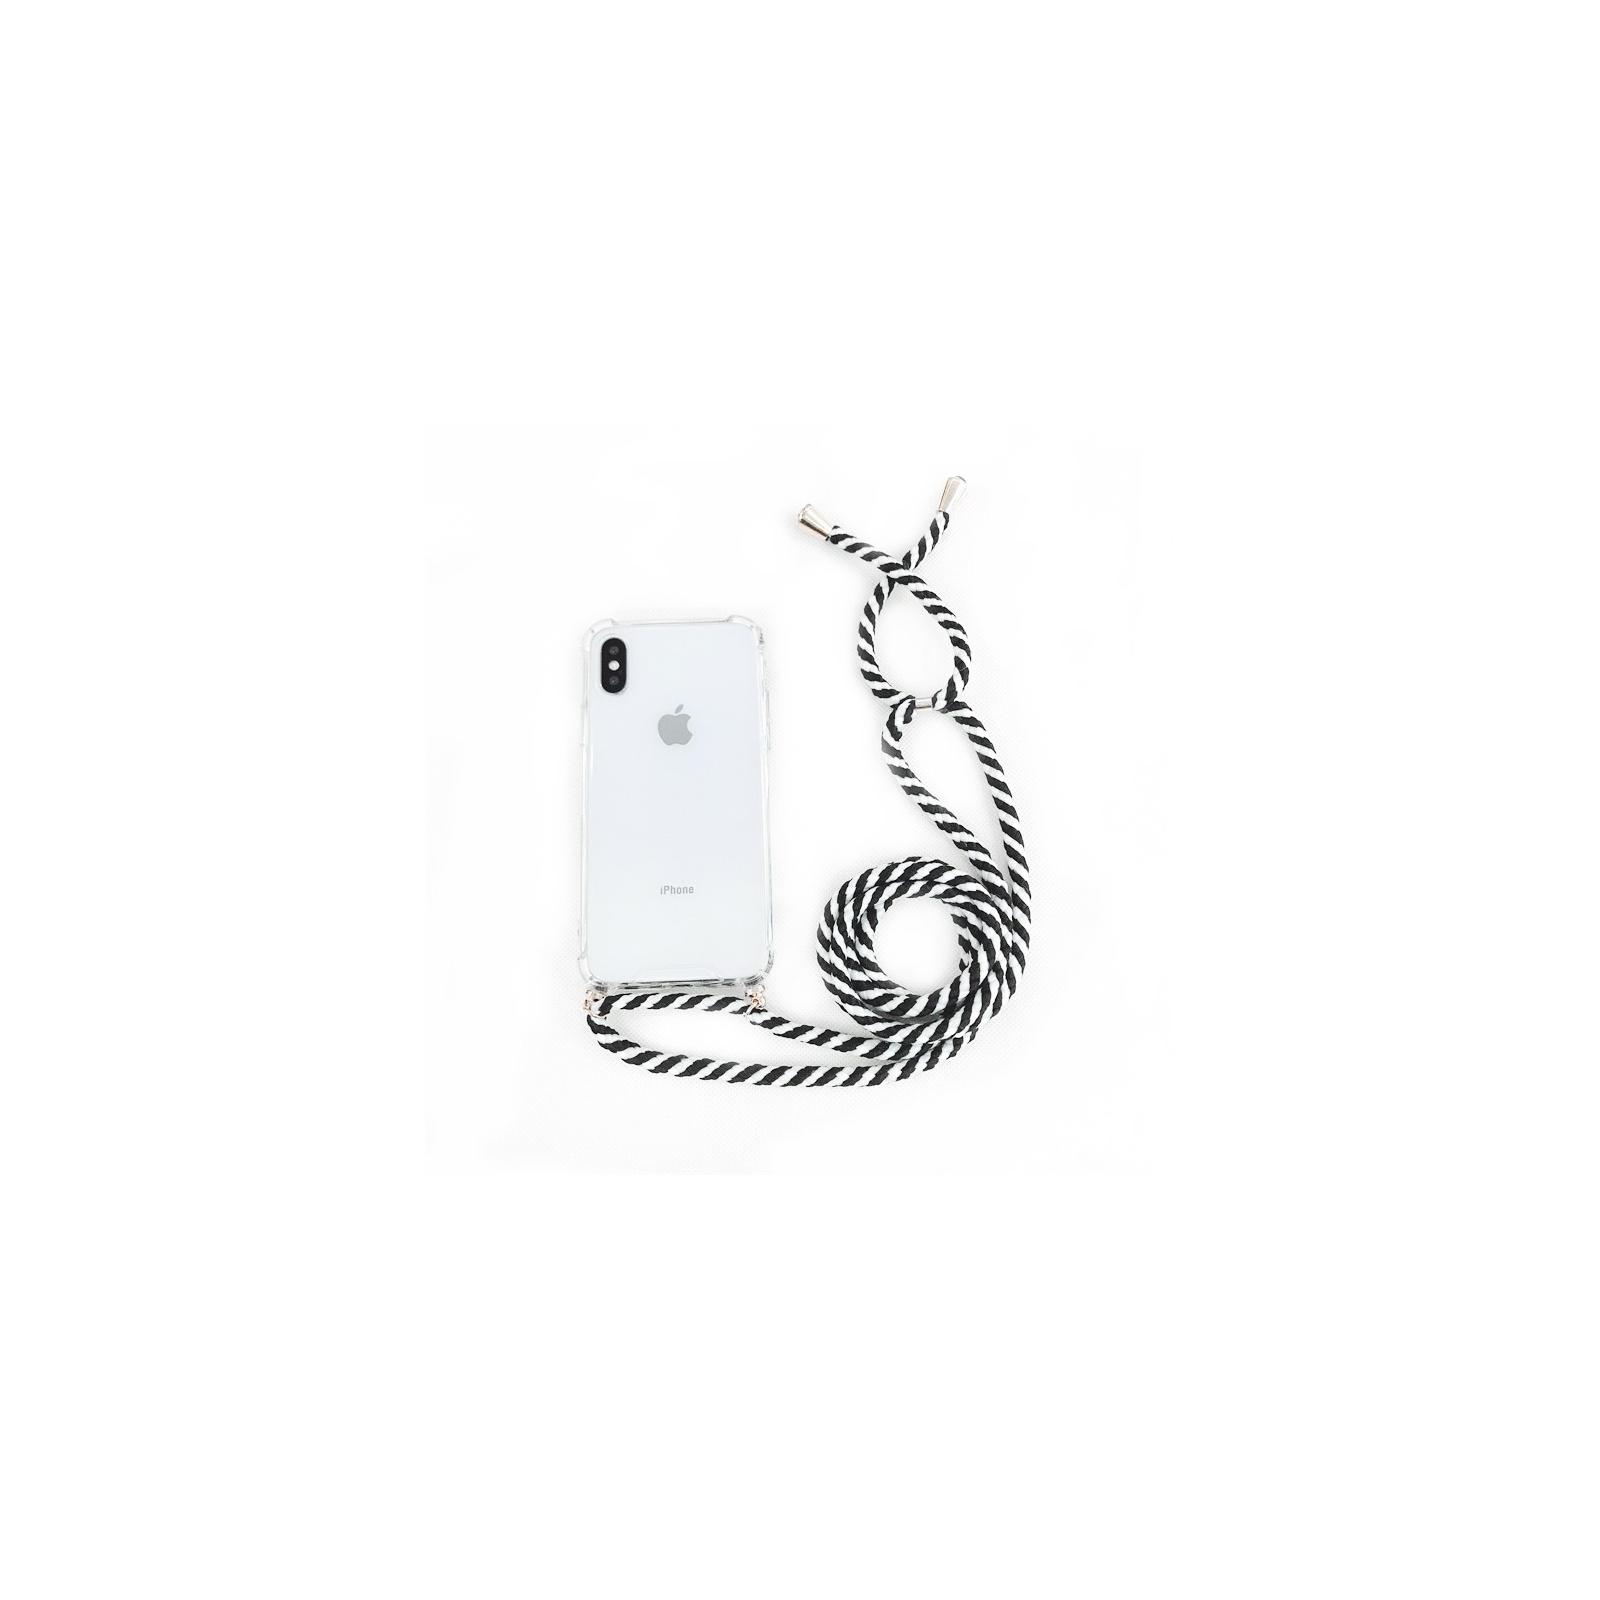 Чехол для моб. телефона BeCover Strap Apple iPhone 11 Pro Spiral (704251) изображение 2